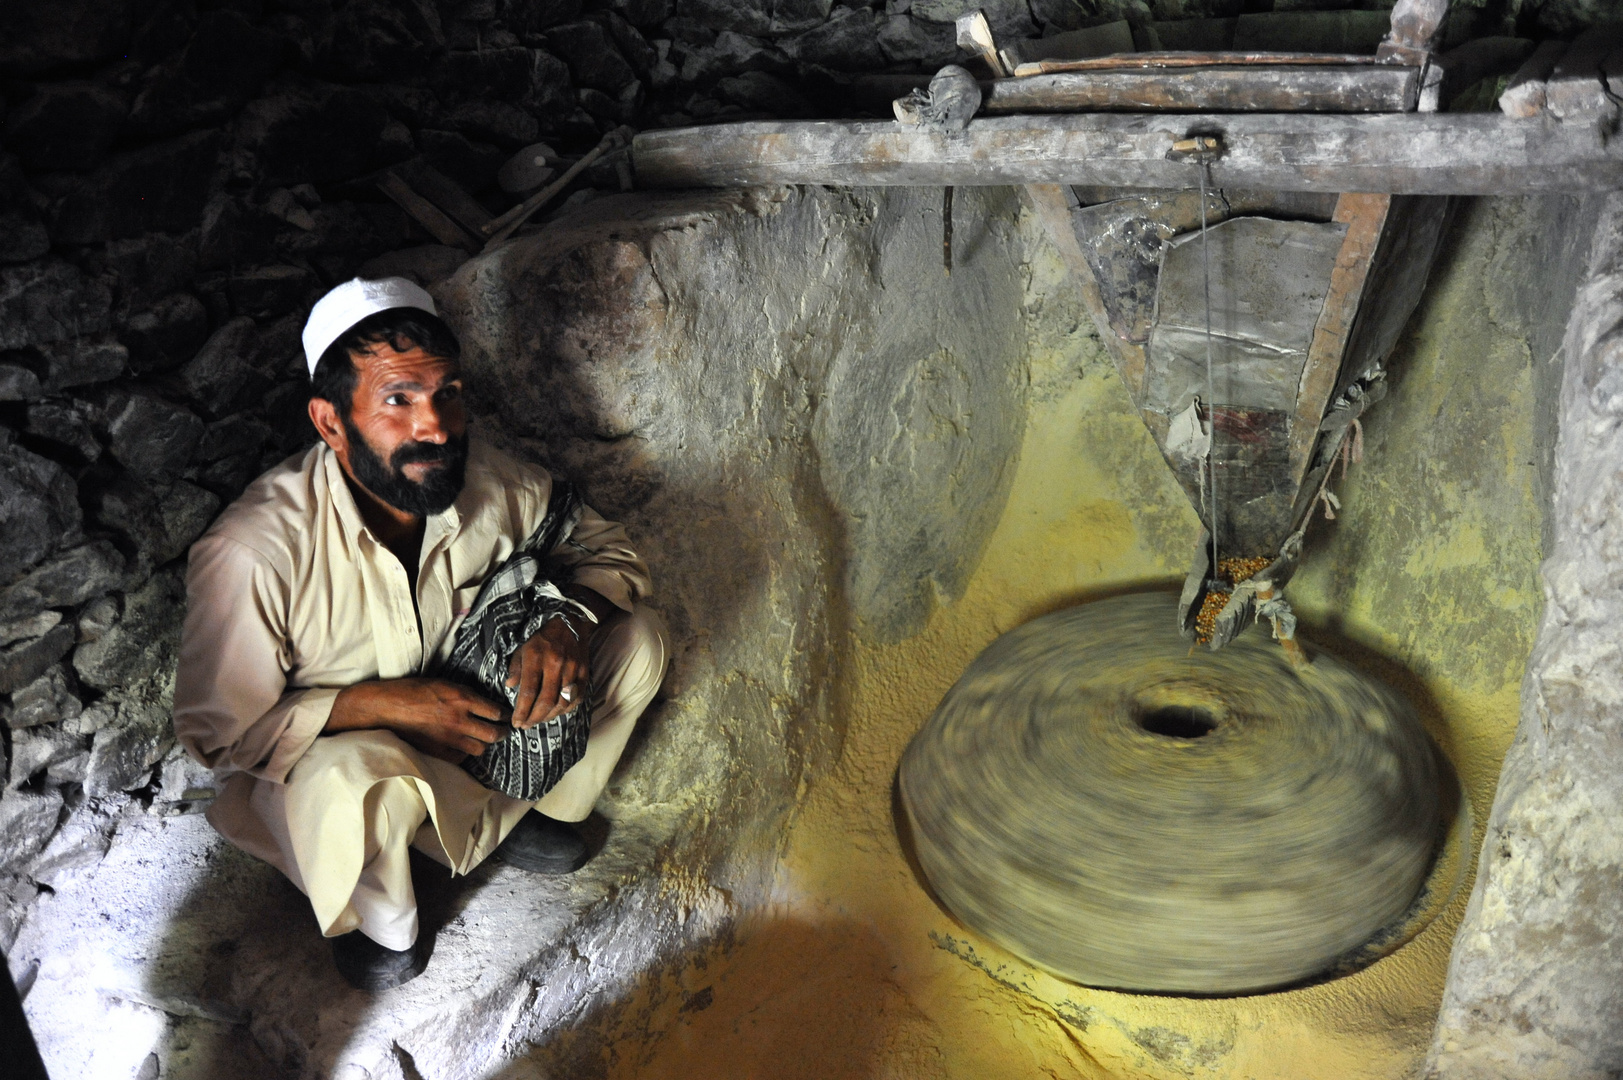 Afghan flourmill